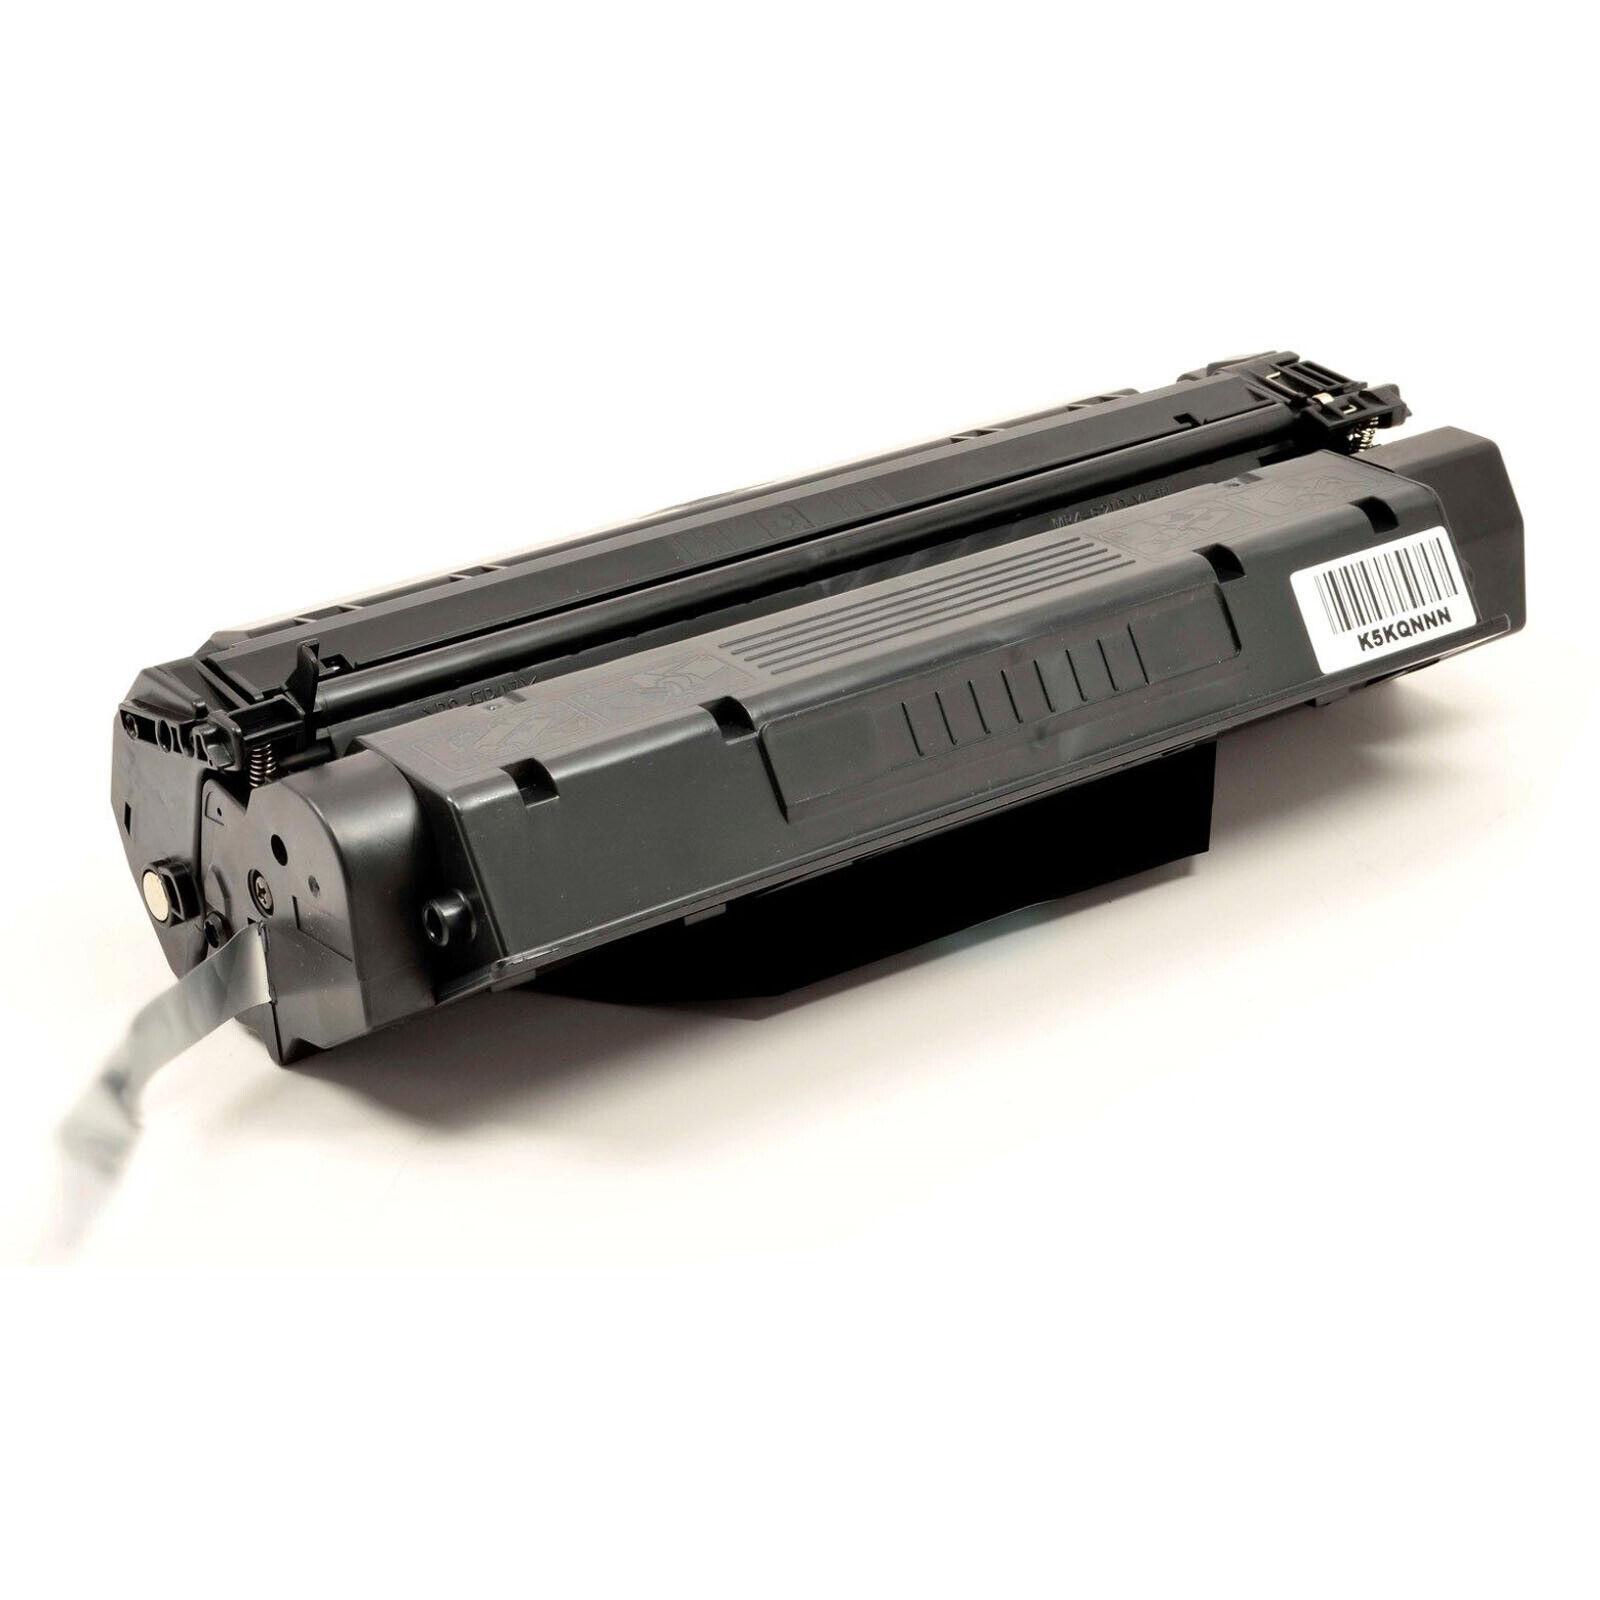 20PK S35 Toner Cartridge For Canon FX8 ImageCLASS D320 D323 D340 D360 D380 D383